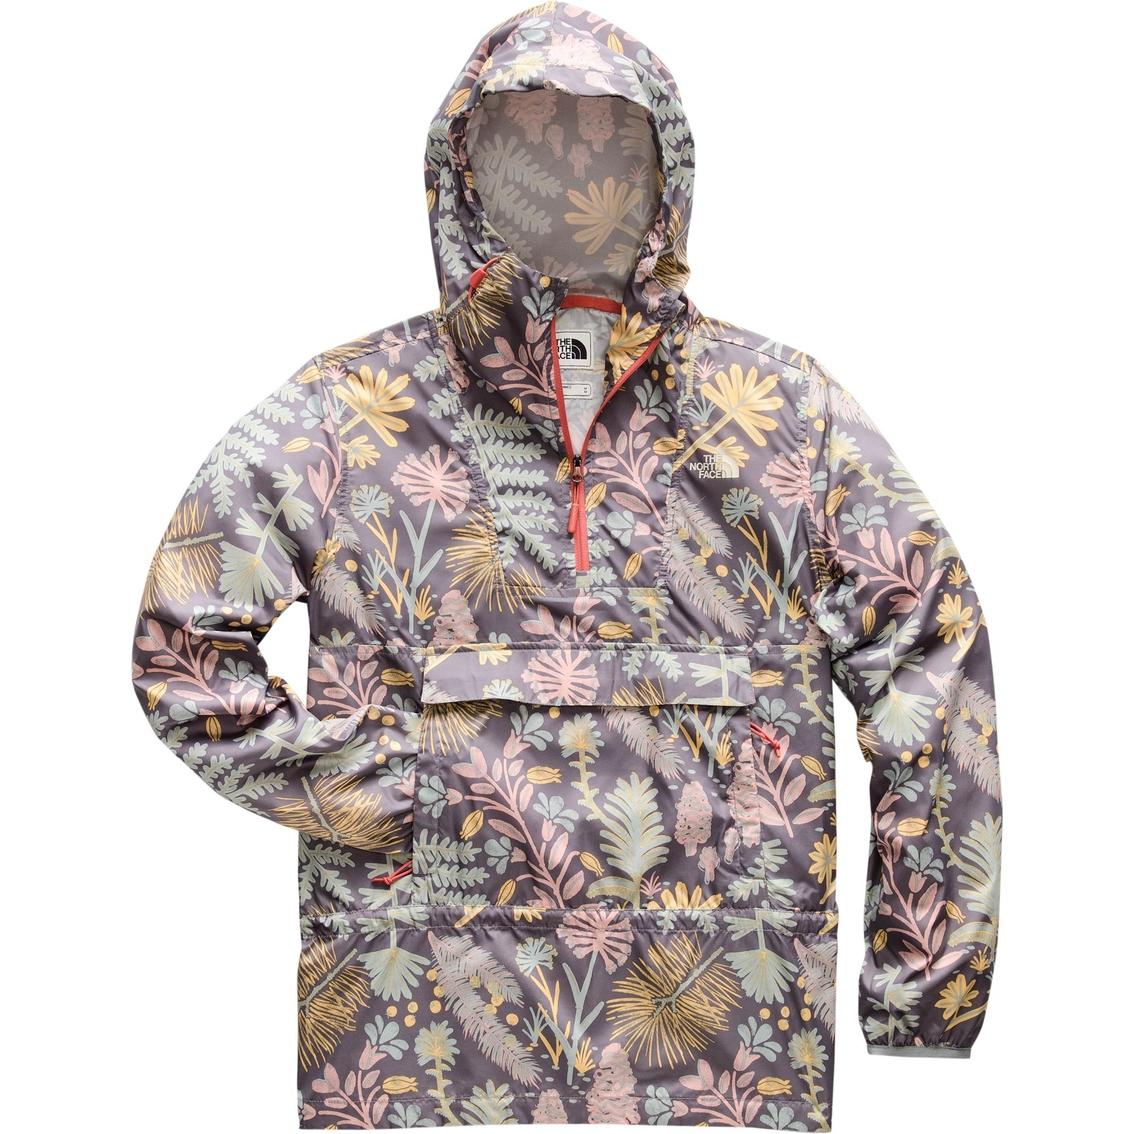 091d3bca9 The North Face Fanorak Jacket | Jackets | Apparel | Shop The Exchange